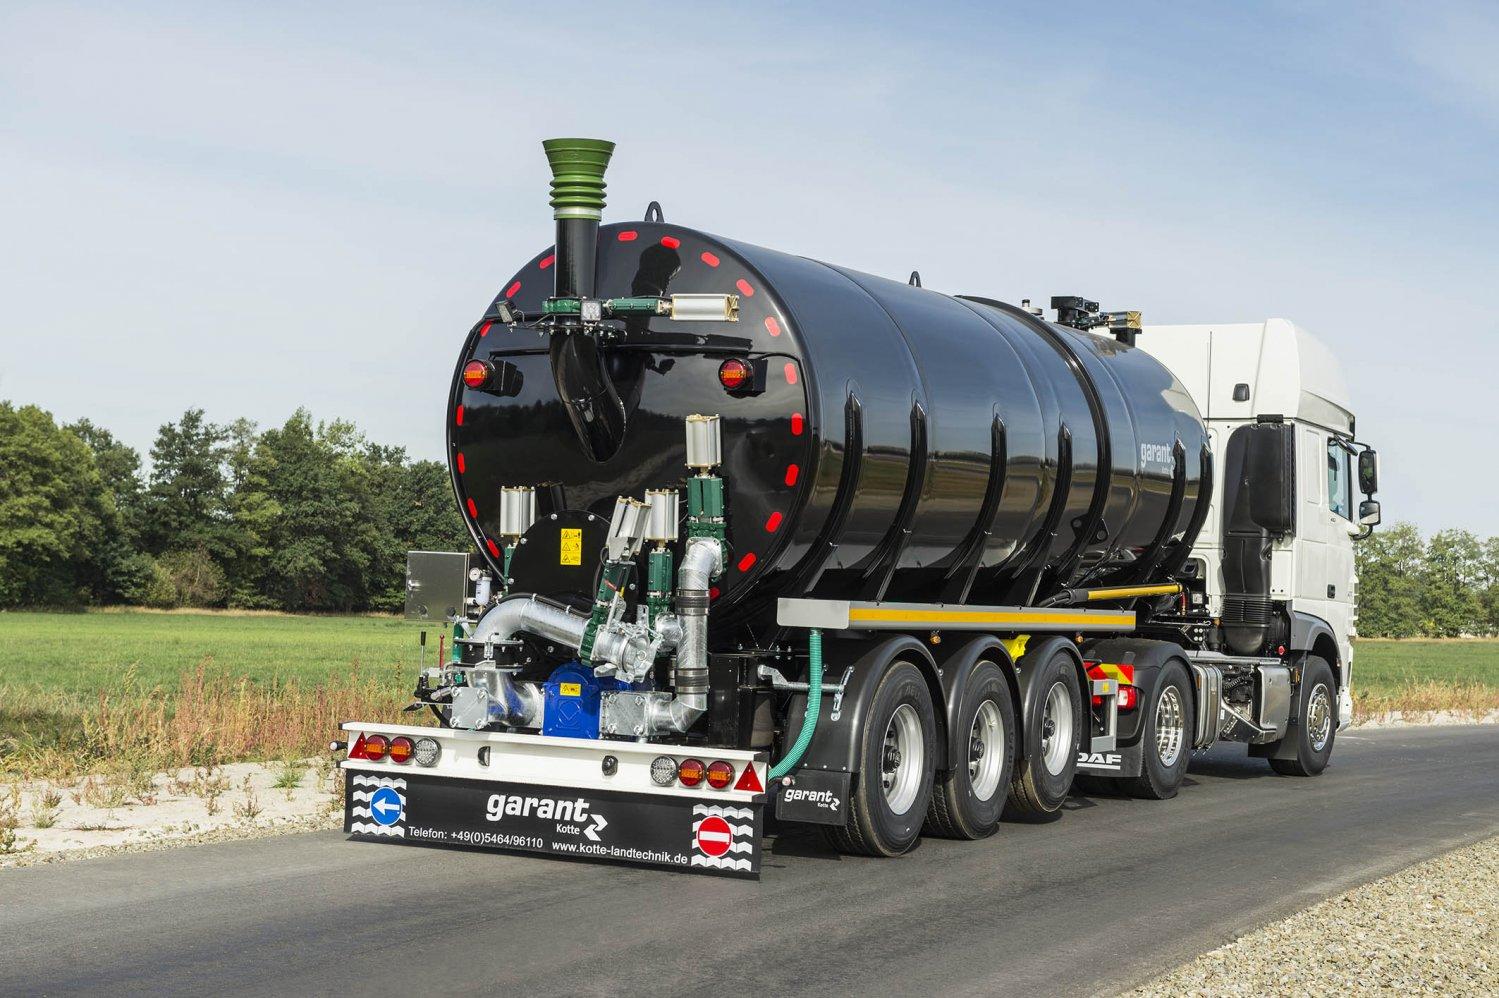 Tanksattelauflieger-gülle-transport-4.jpg